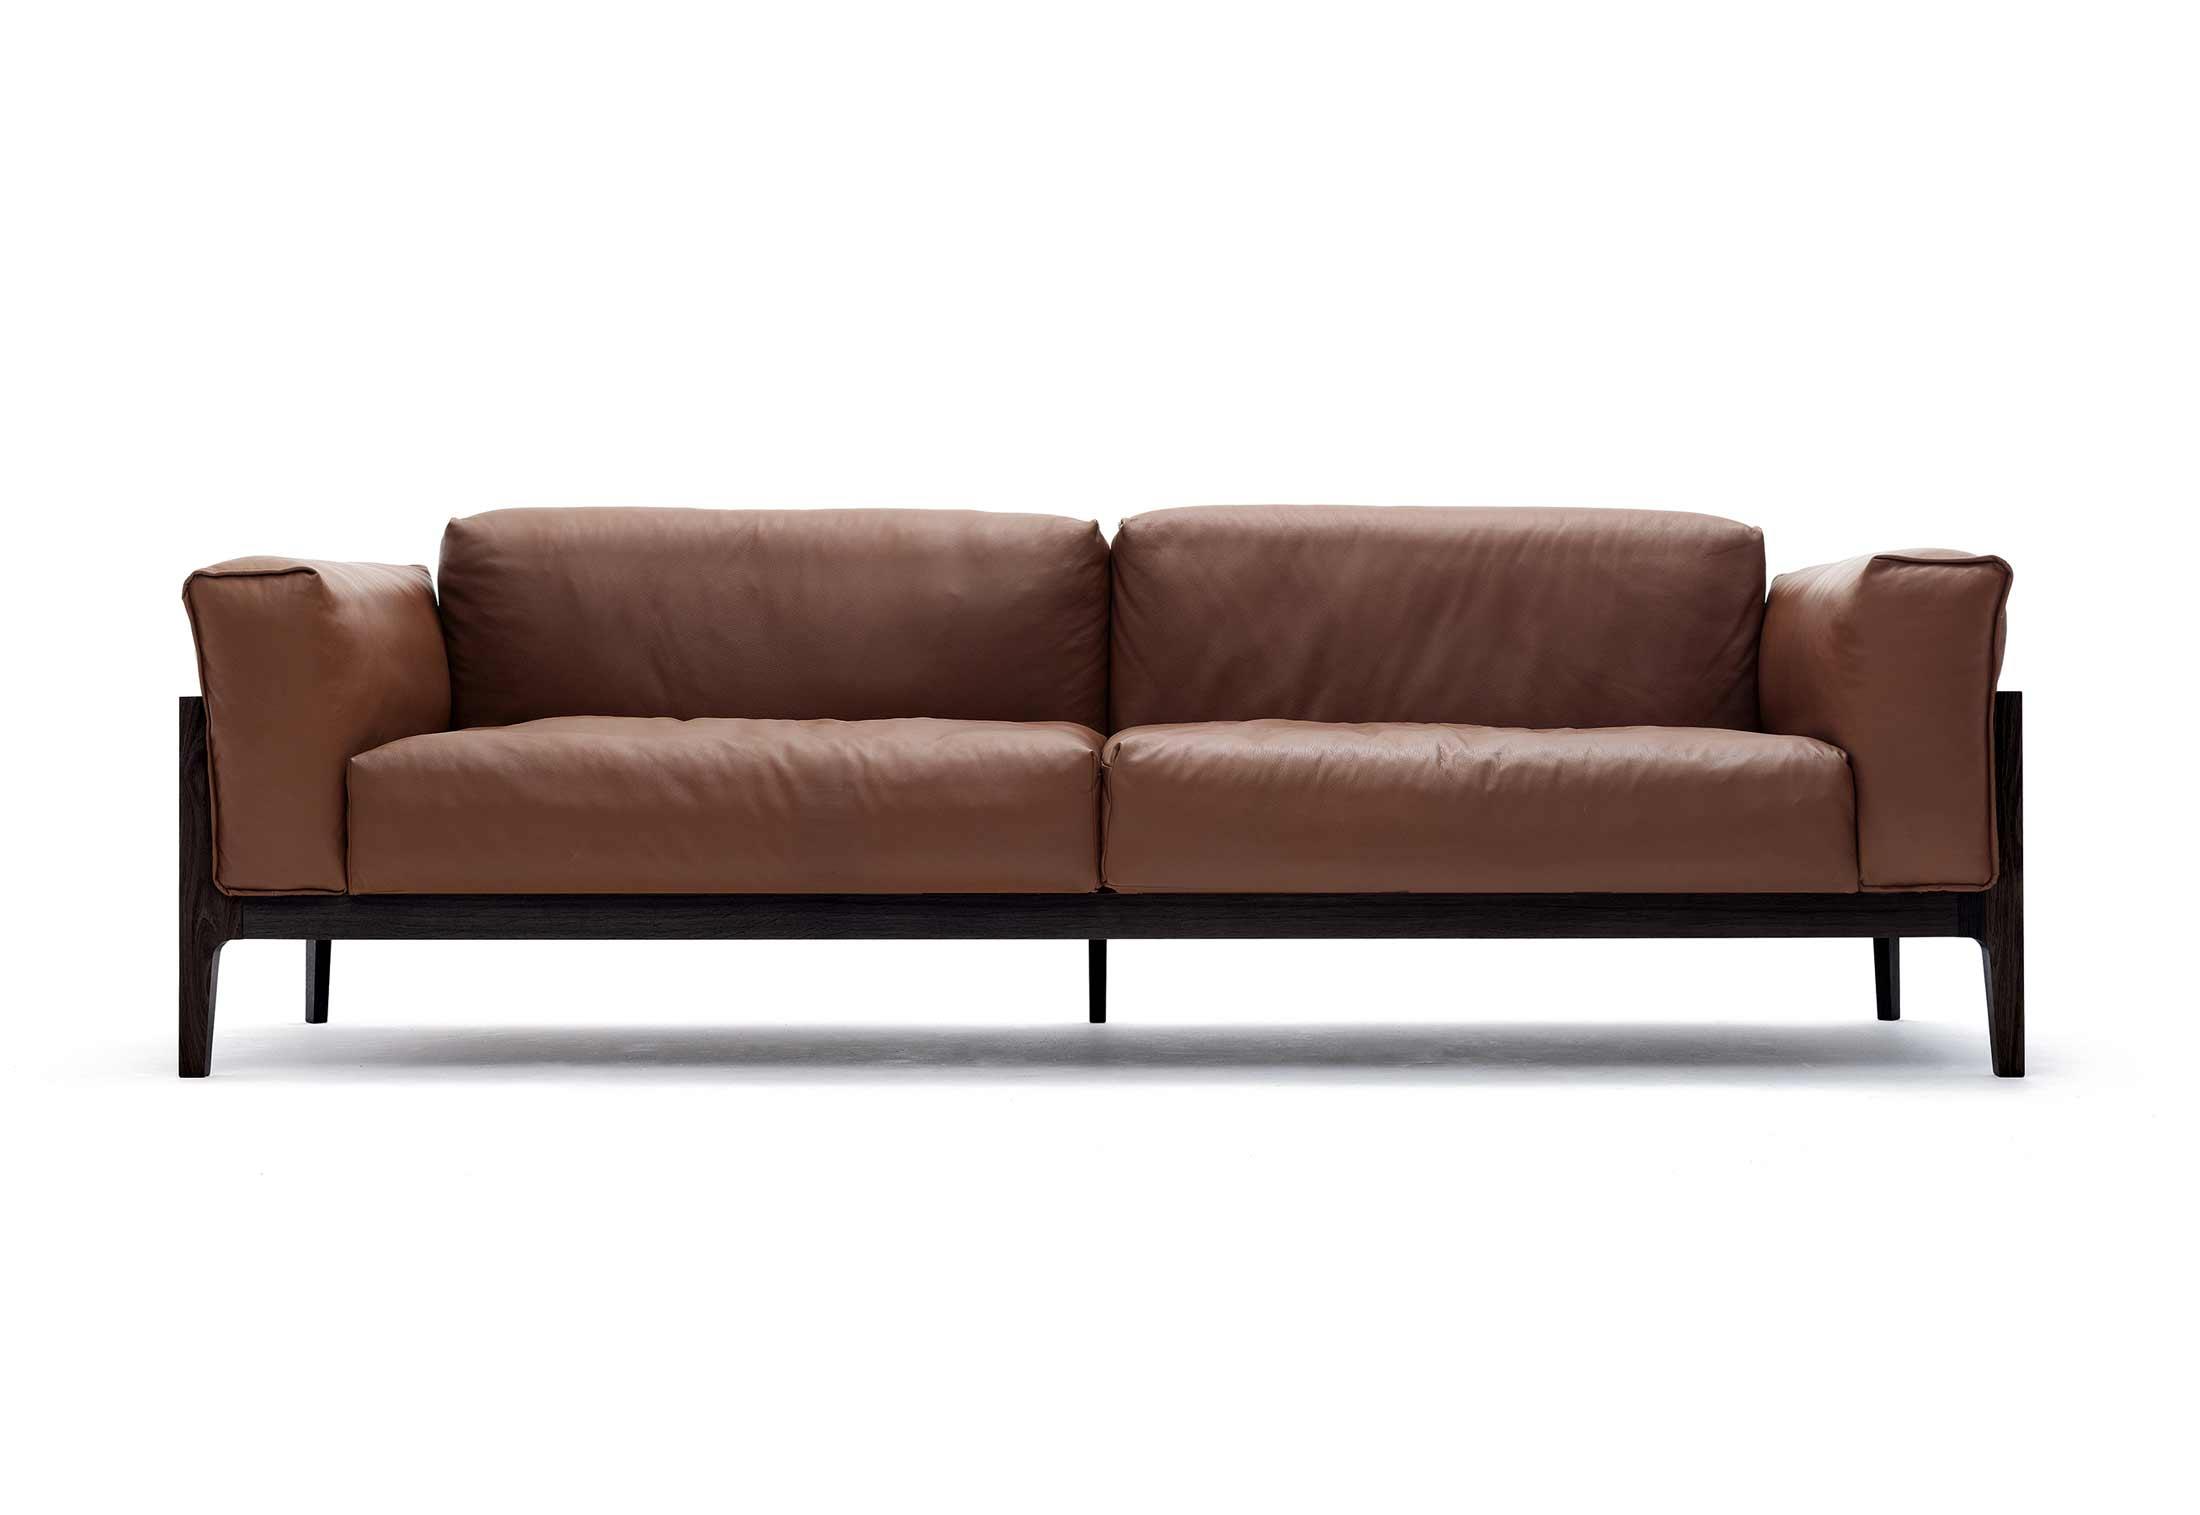 Elm Sofacor | Stylepark Regarding Elm Sofa Chairs (Photo 14 of 20)